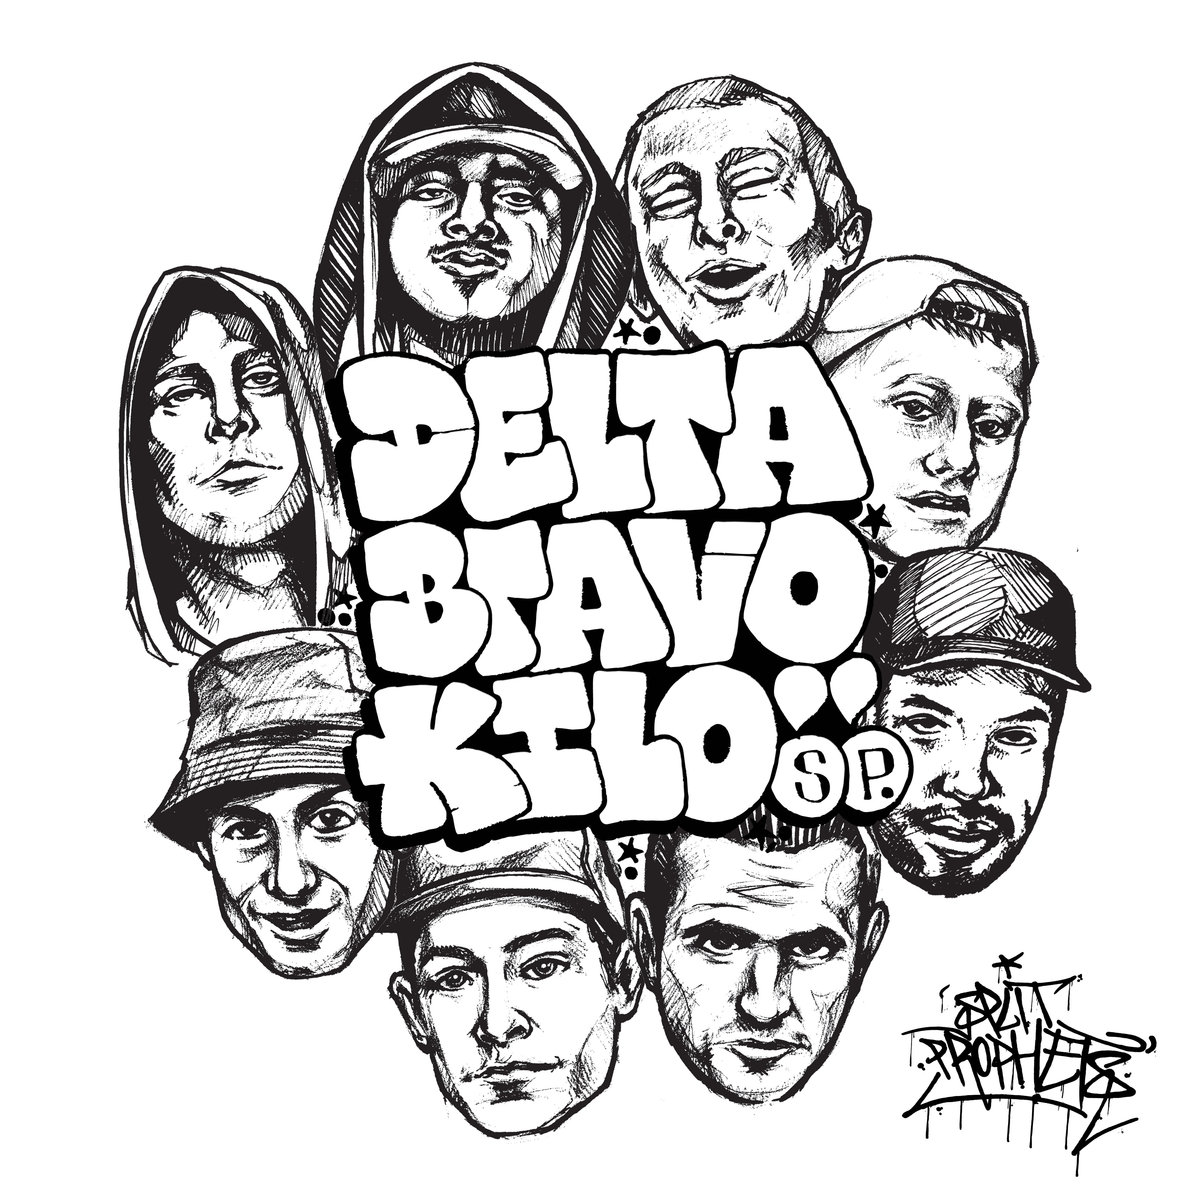 Split Prophets - Delta Bravo Kilo